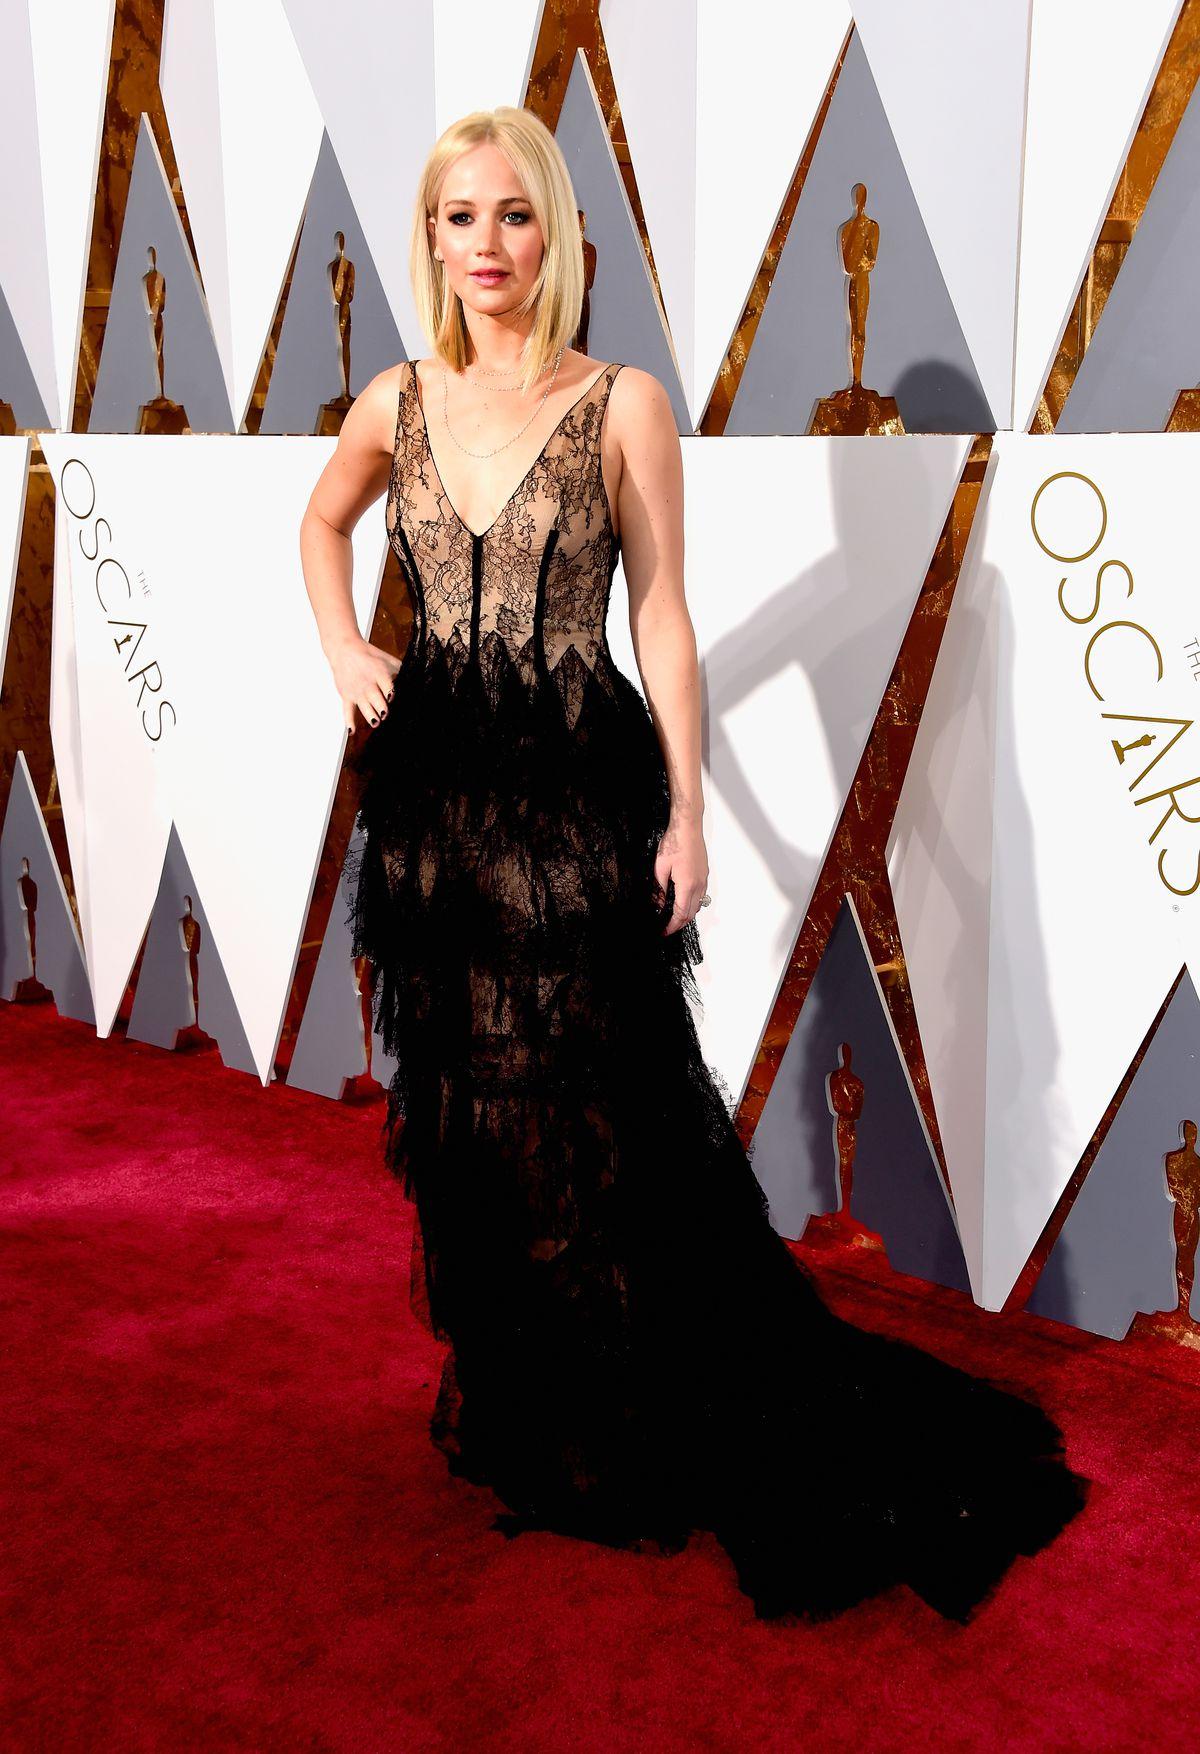 Jennifer Lawrence in custom Dior at the 2016 Oscars.